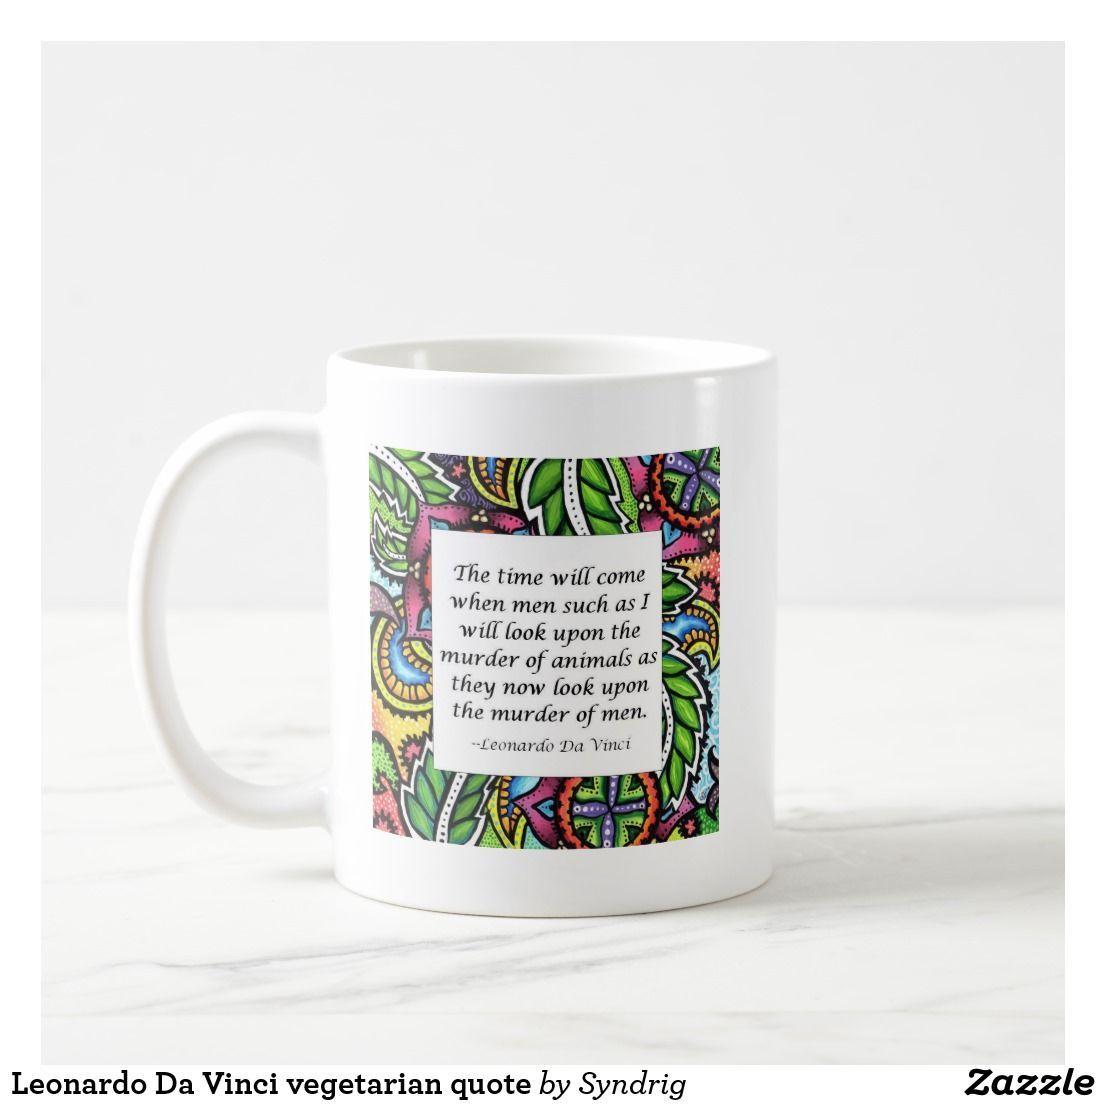 Leonardo Da Vinci vegetarian quote Coffee Mug | Zazzle.com #vegetarianquotes Leonardo Da Vinci vegetarian quote #vegetarianquotes